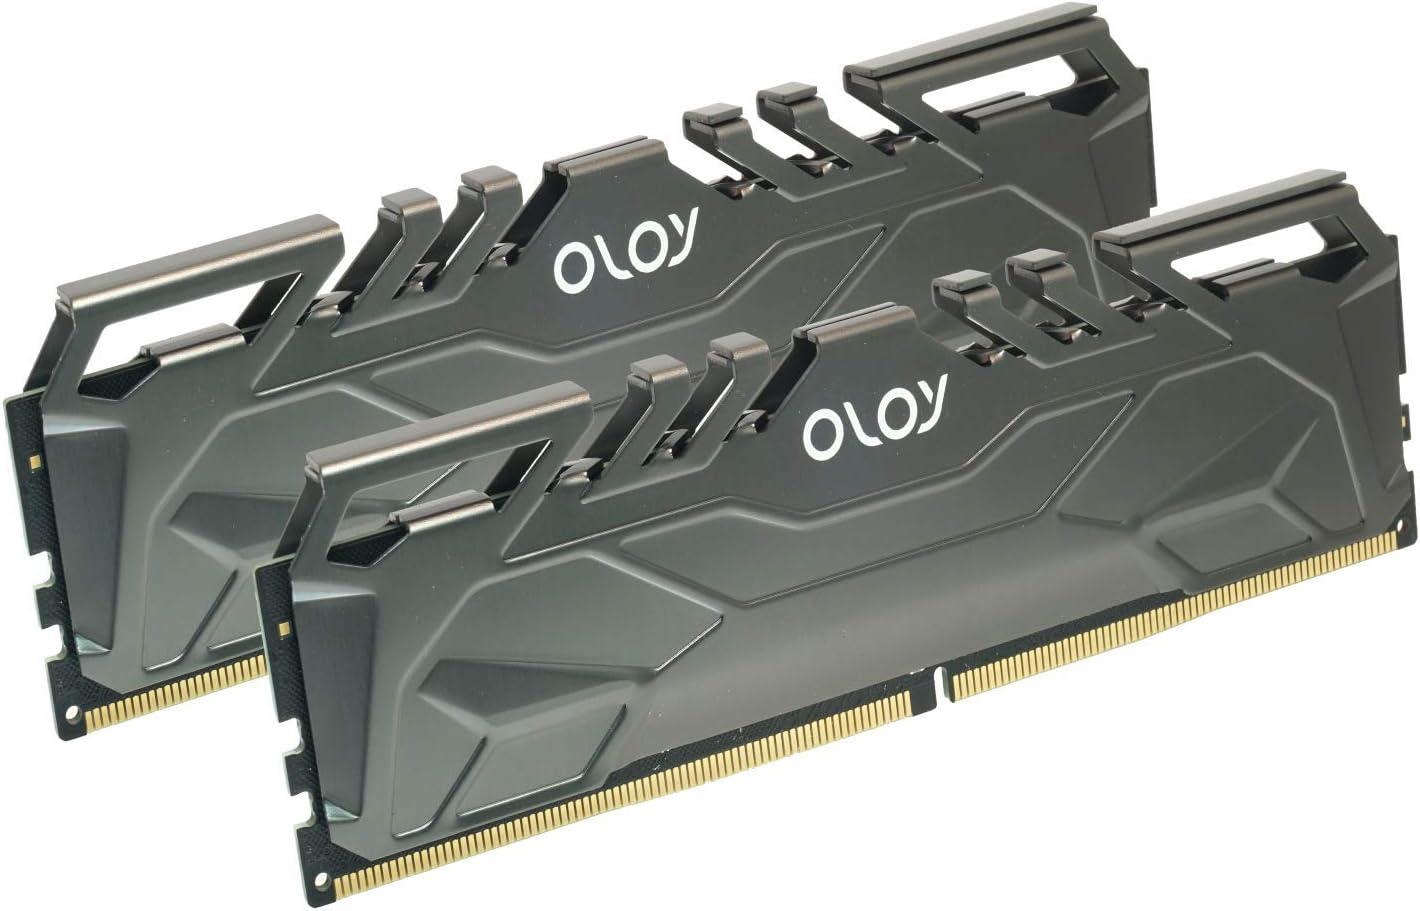 OLOy DDR4 RAM 16GB 2x8GB 3200 MHz CL16 1.35V 288-Pin Desktop Gaming UDIMM MD4U0832160BHKDA